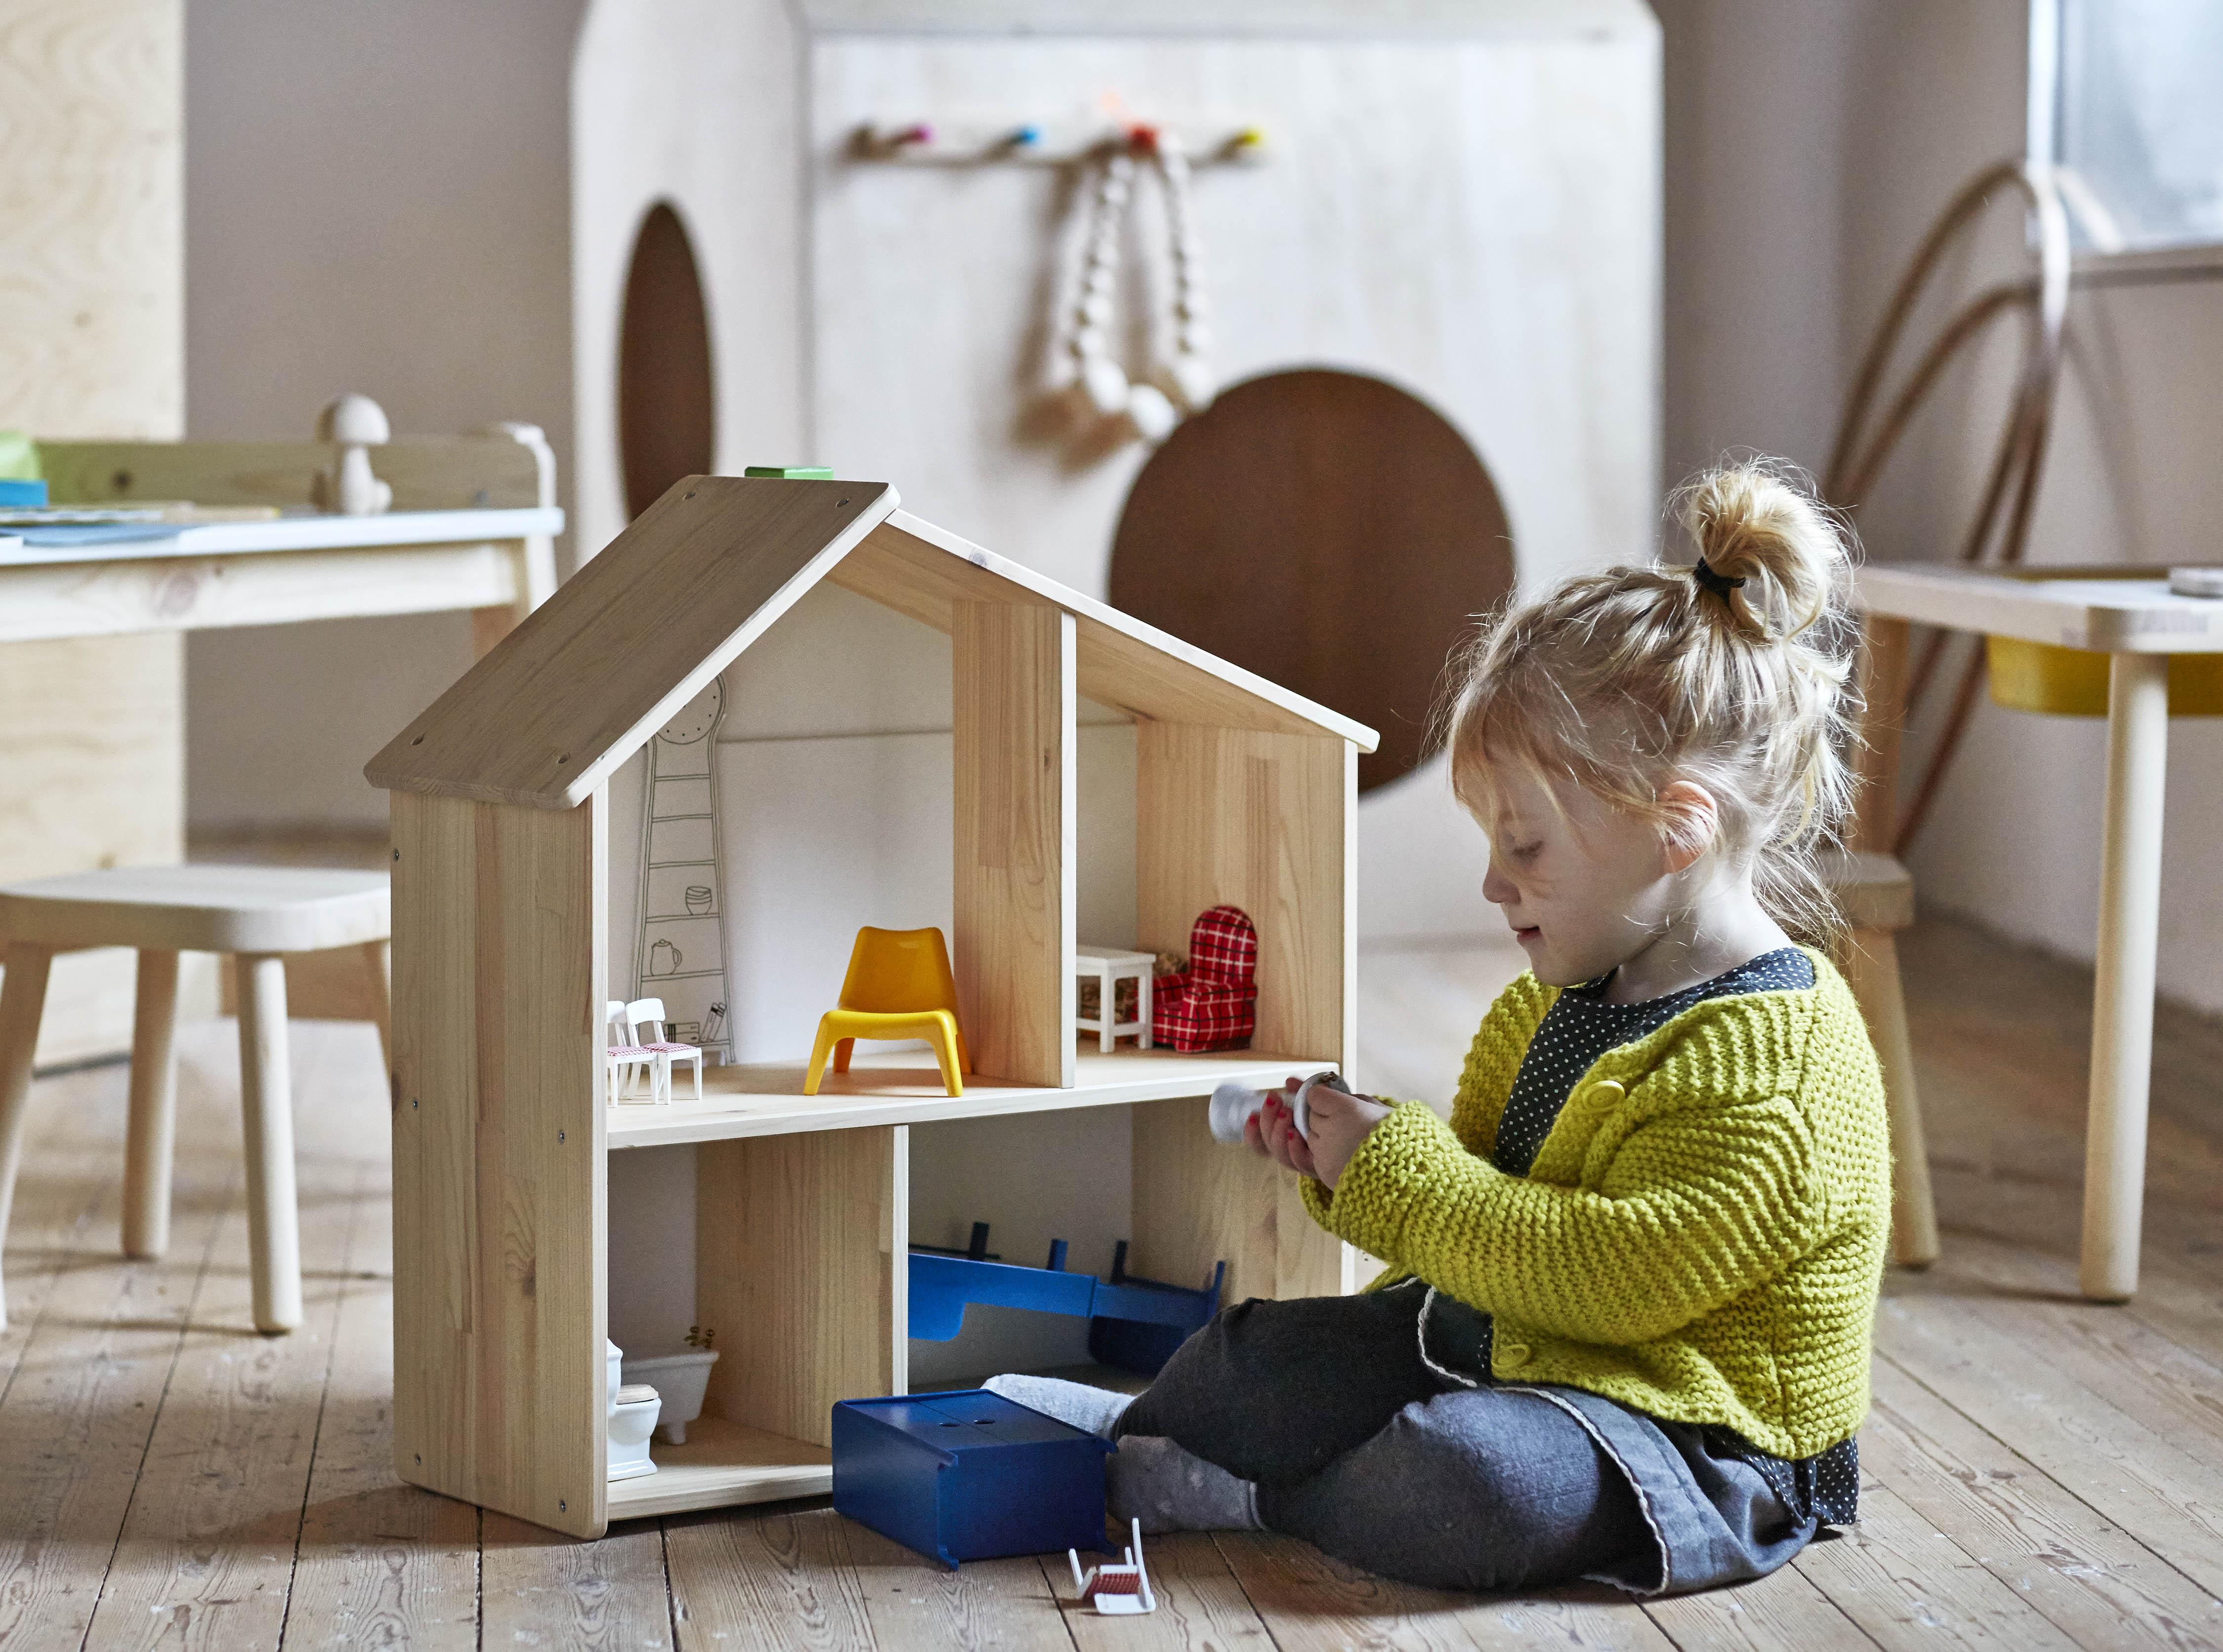 lifestyle | nieuwe ikea babykamer & kinderkamer collectie, Deco ideeën